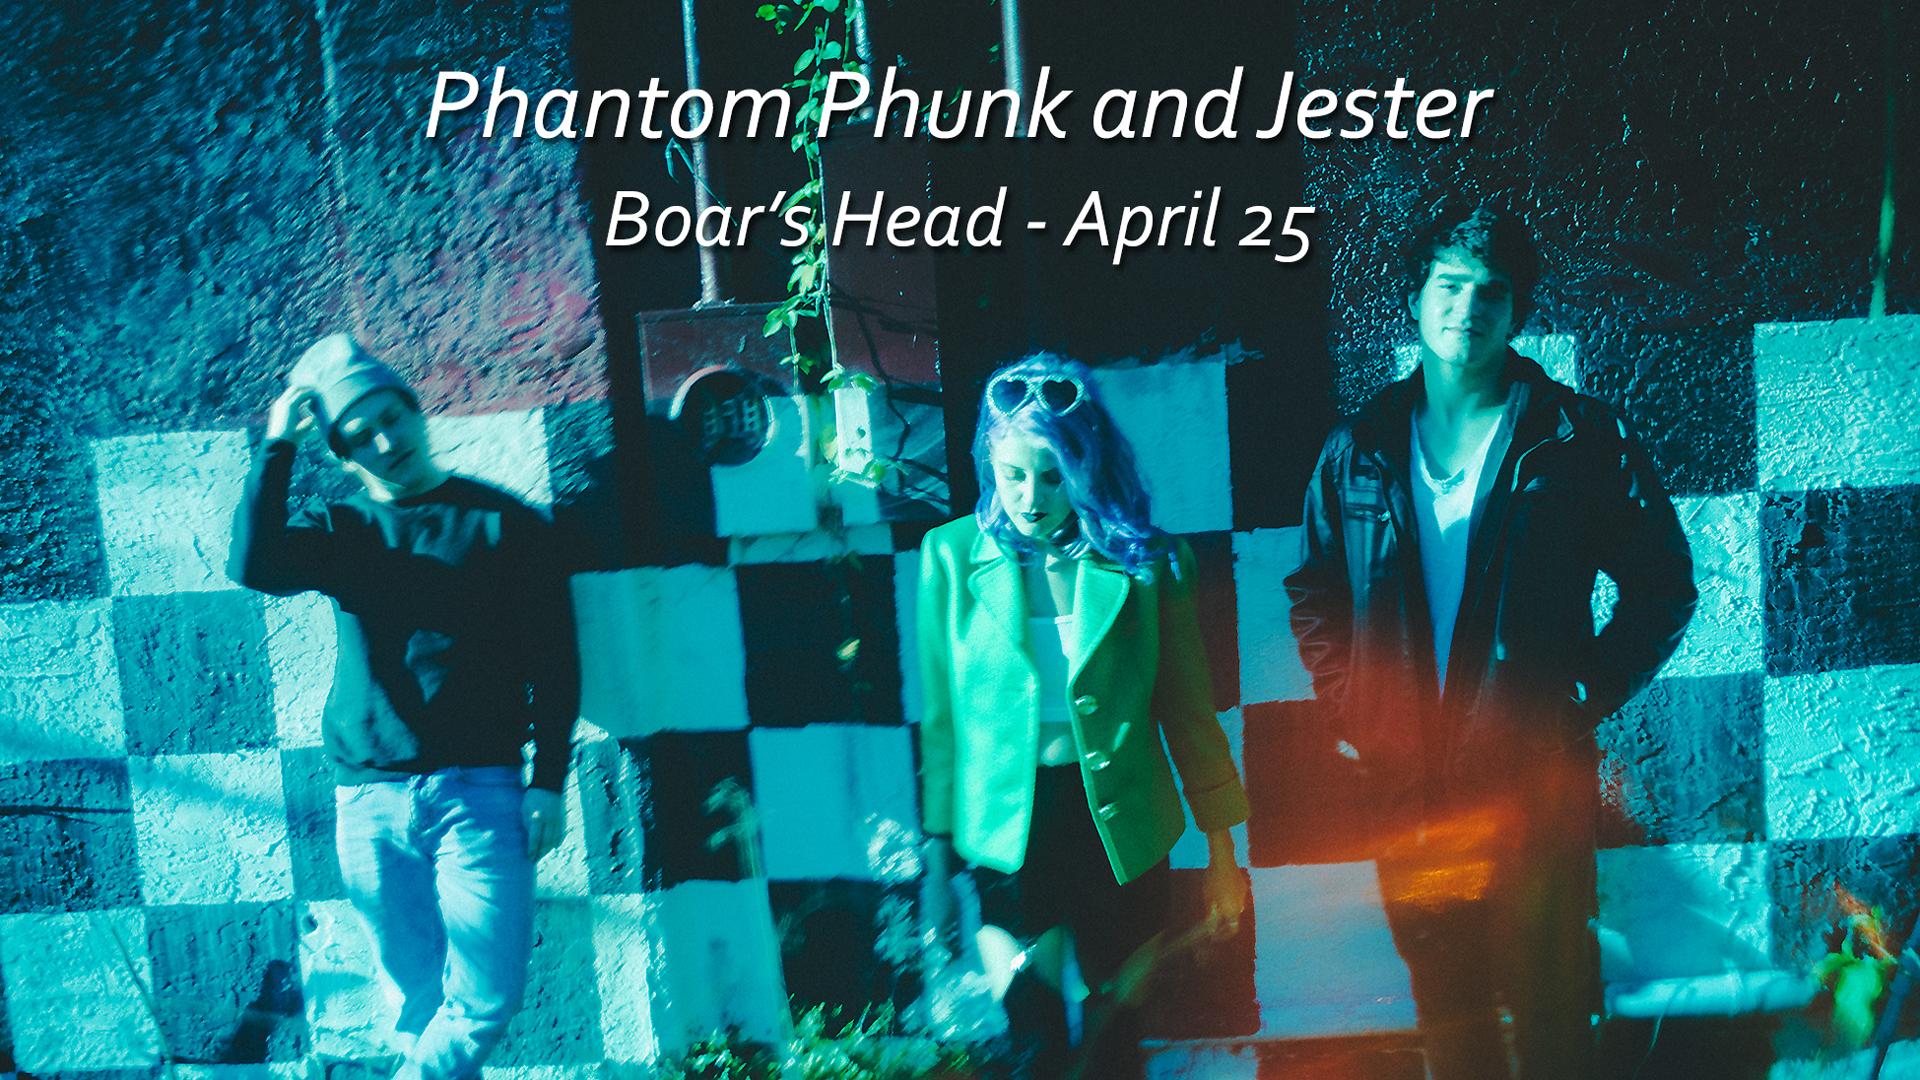 Event-Flyer-Boar's-Head-Athens_-9-INT_1920FBWeb.jpg